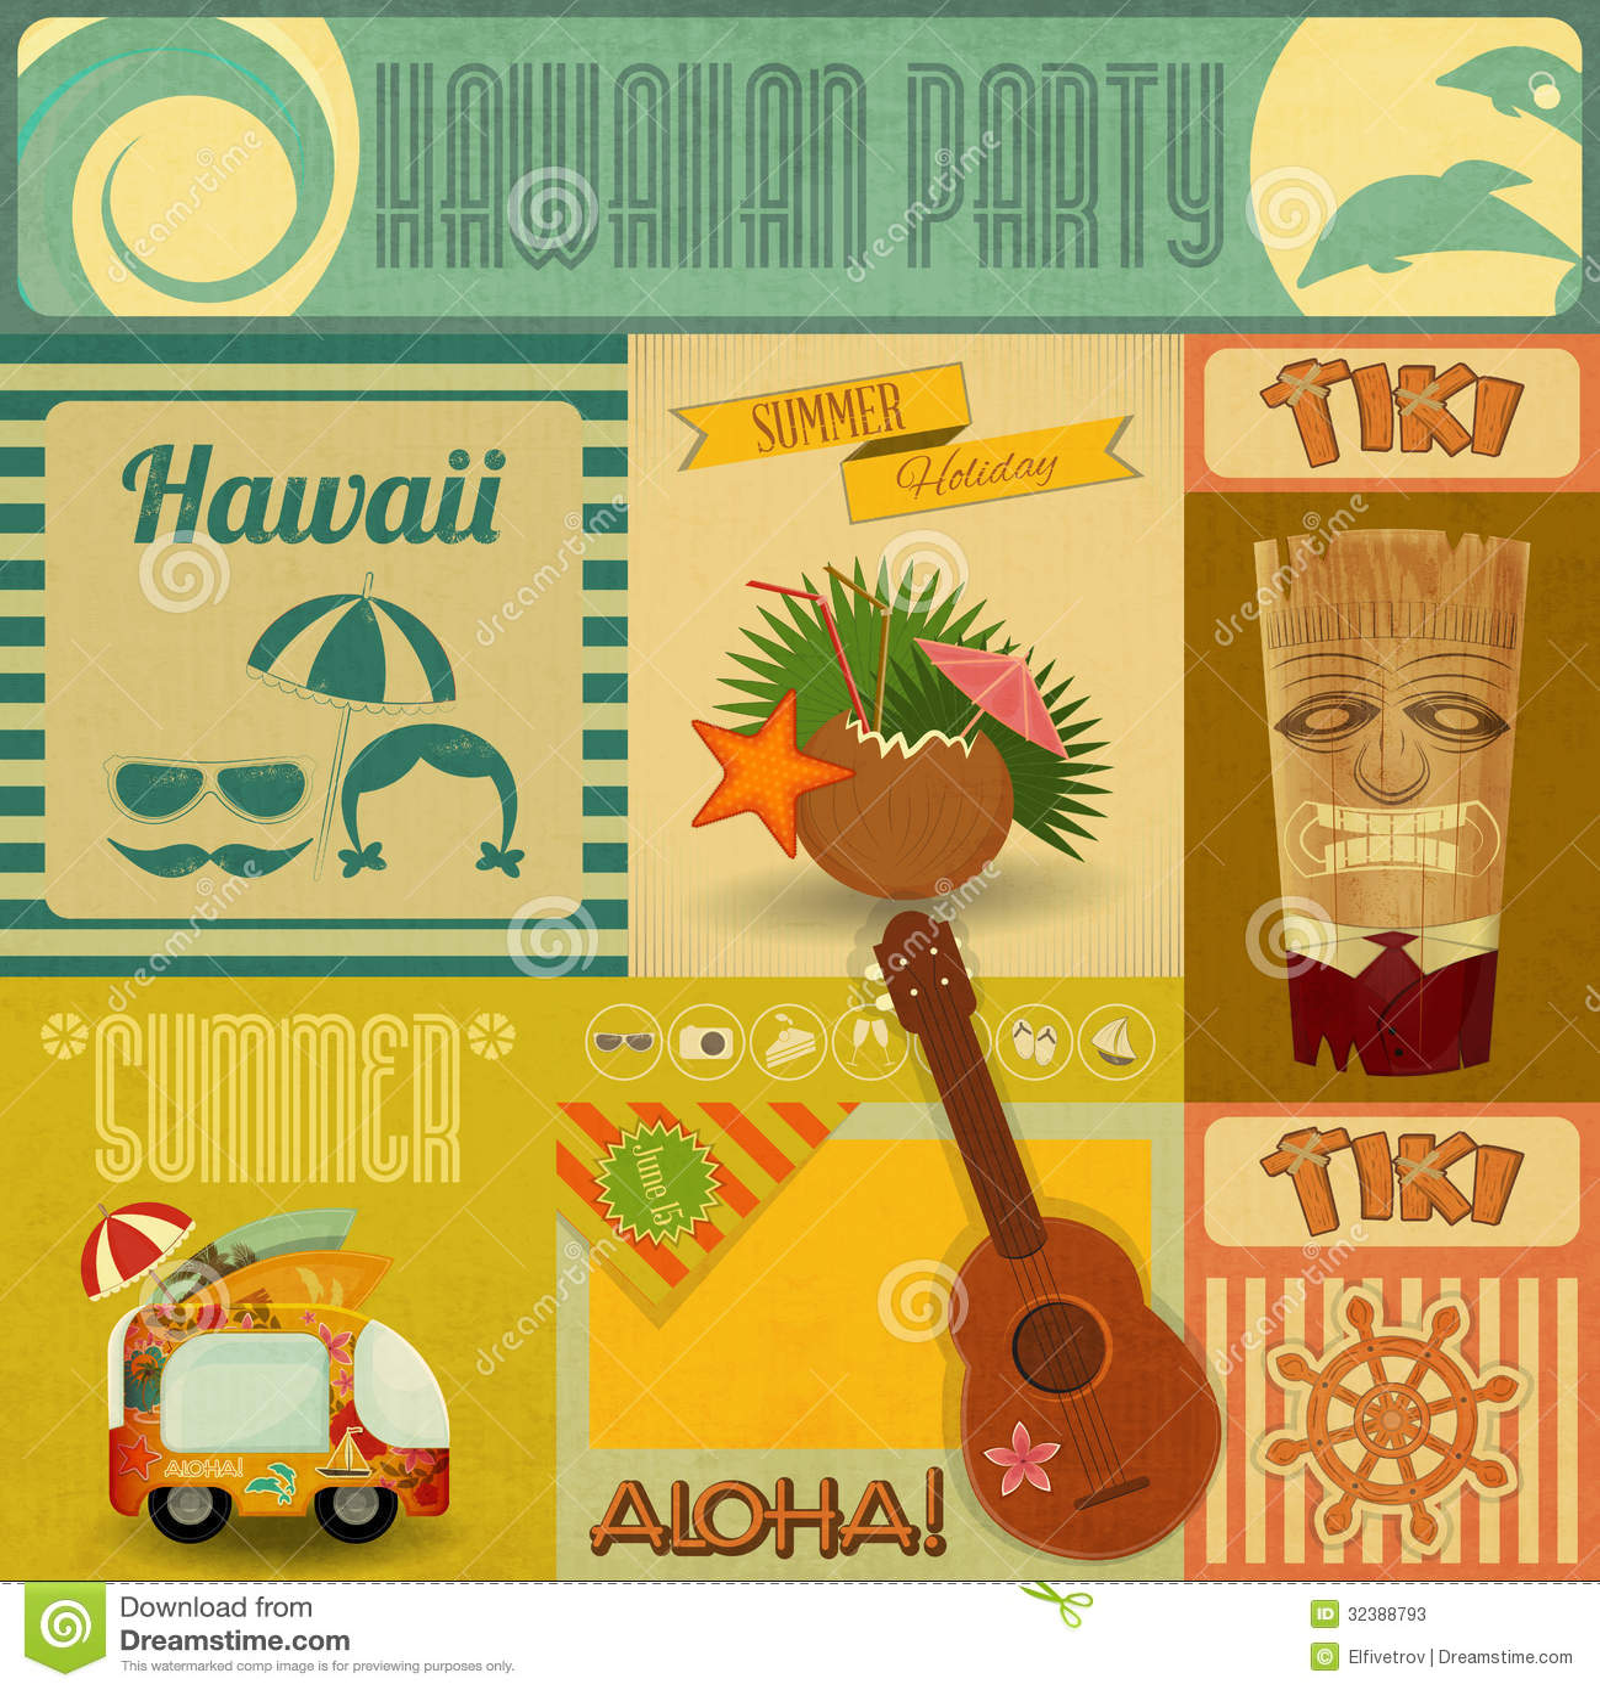 Retro greetings from hawaii postcard stock illustration hawaii vintage card stock photos kristyandbryce Choice Image